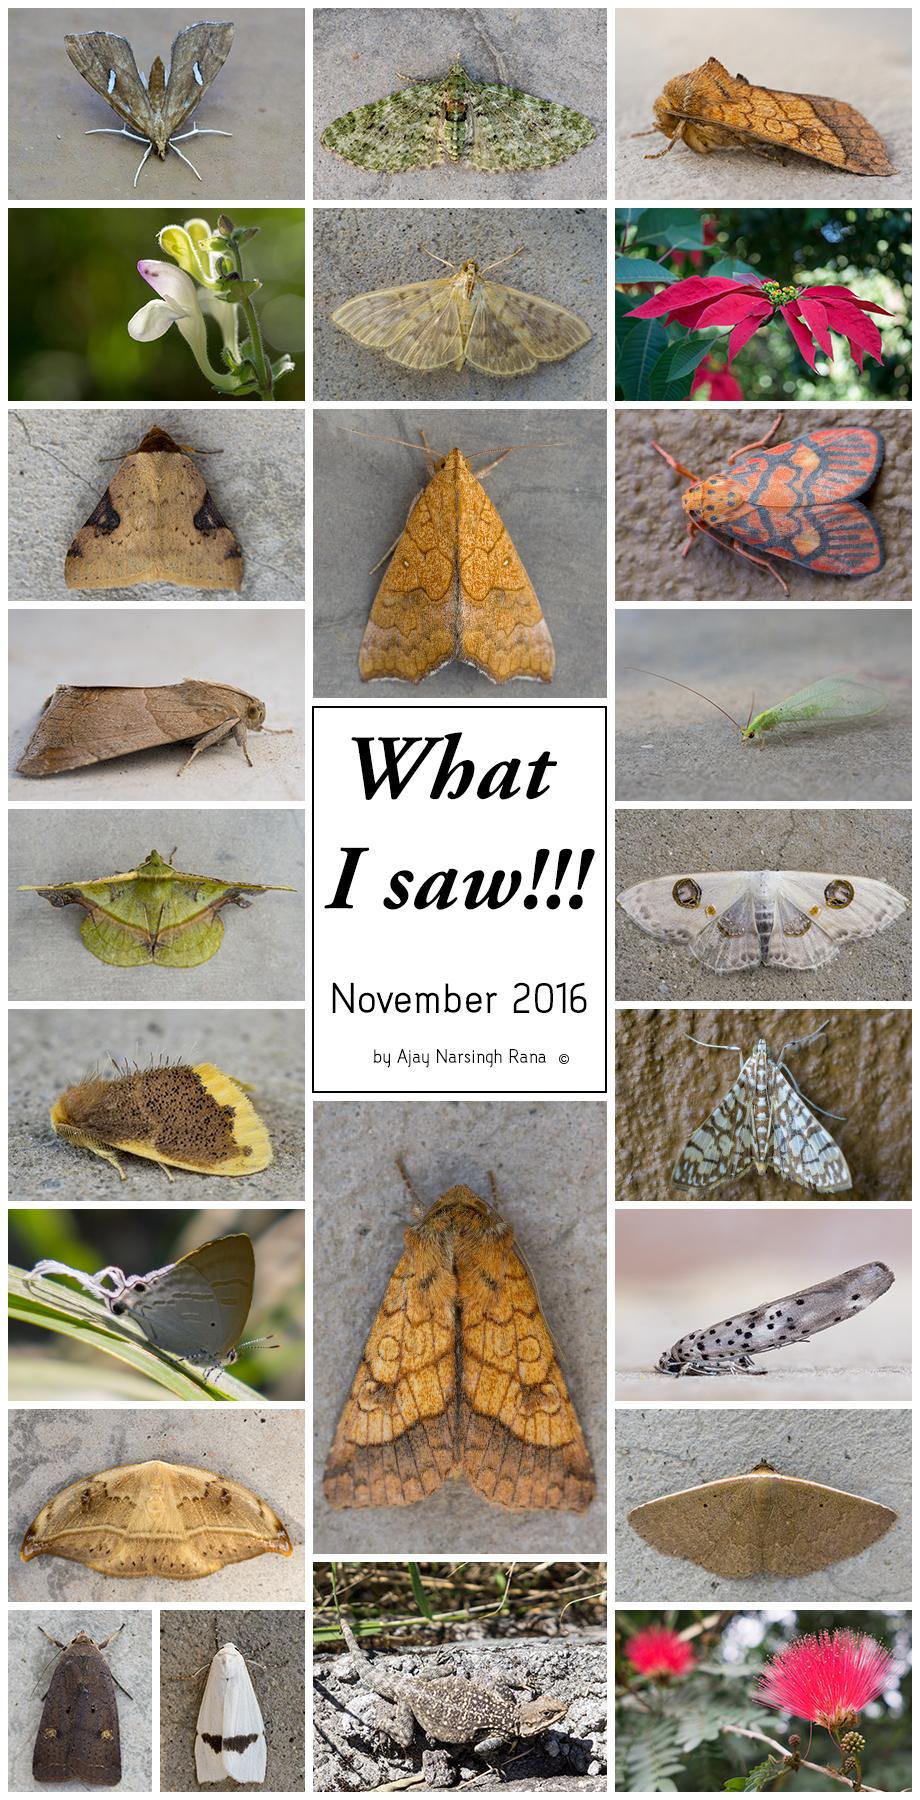 Prakriti Nepal_What i saw in November 2016